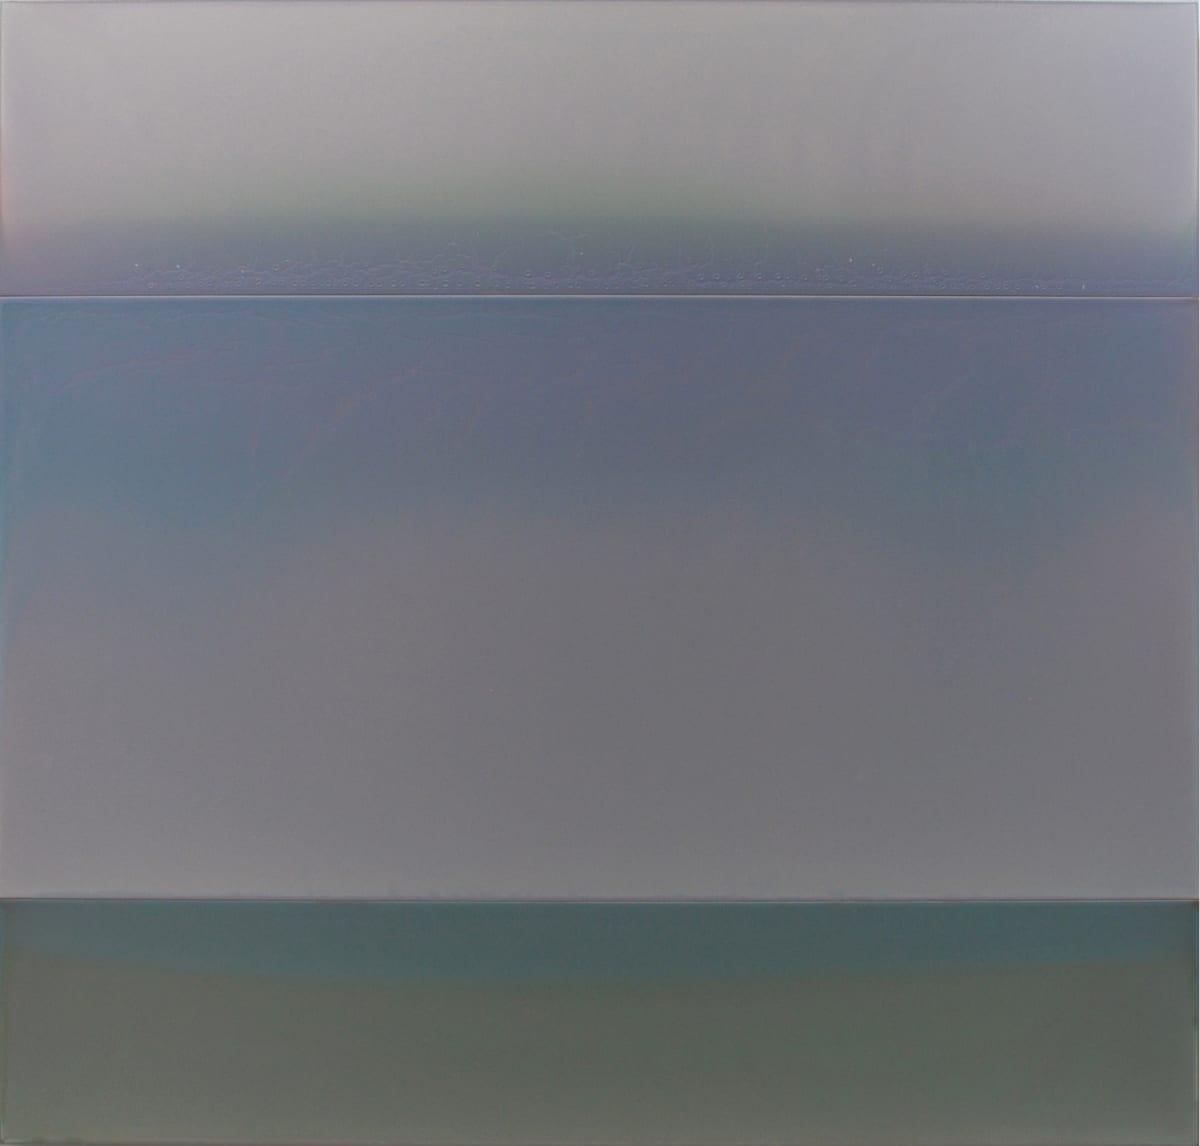 Susan English, Split Cloud, 2019